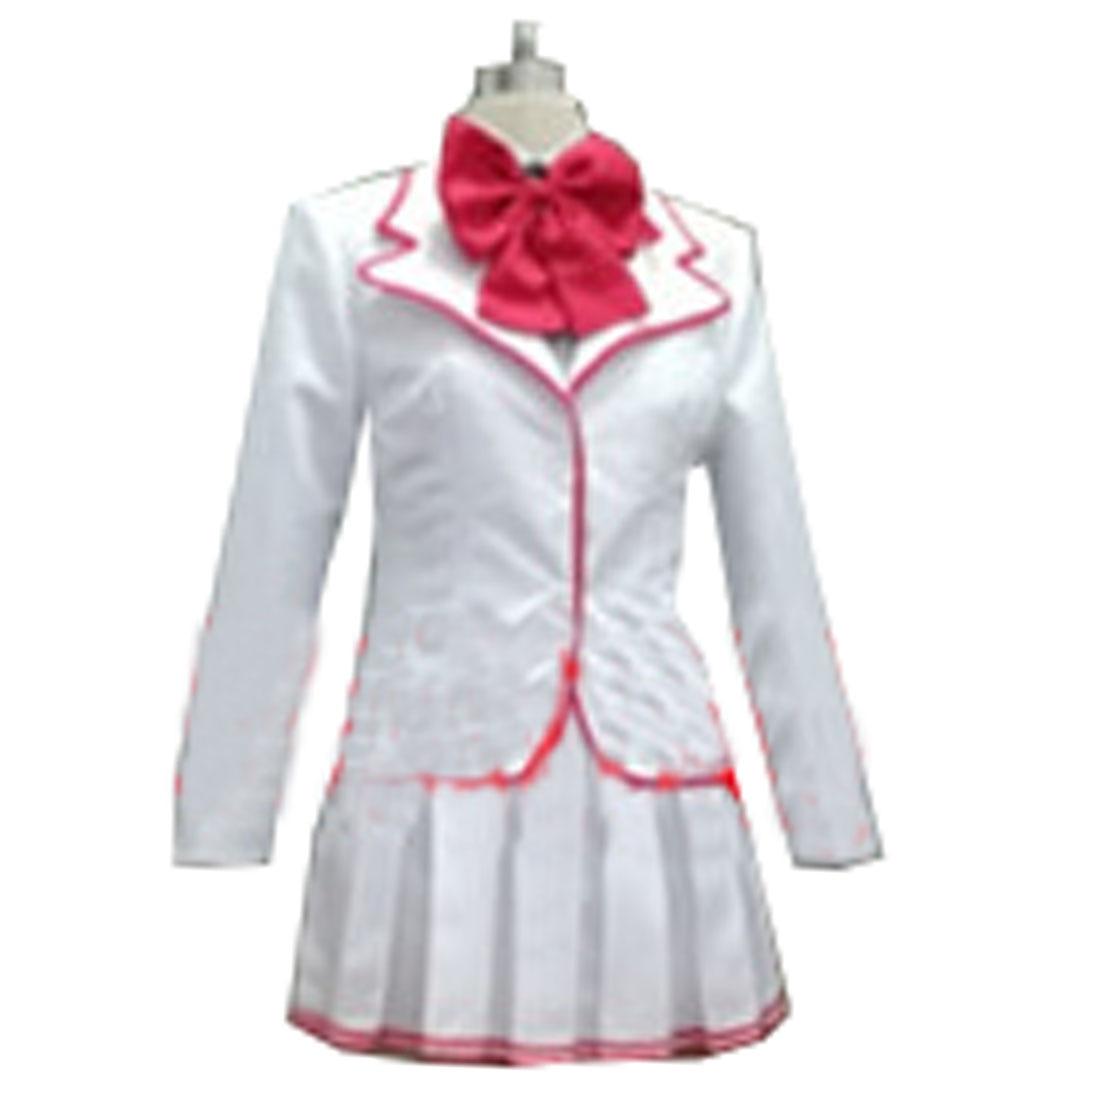 2019 Yandere Simulator Ayano Aishi Yandere-chan Aoi Ryugoku School Uniform Cosplay Costume